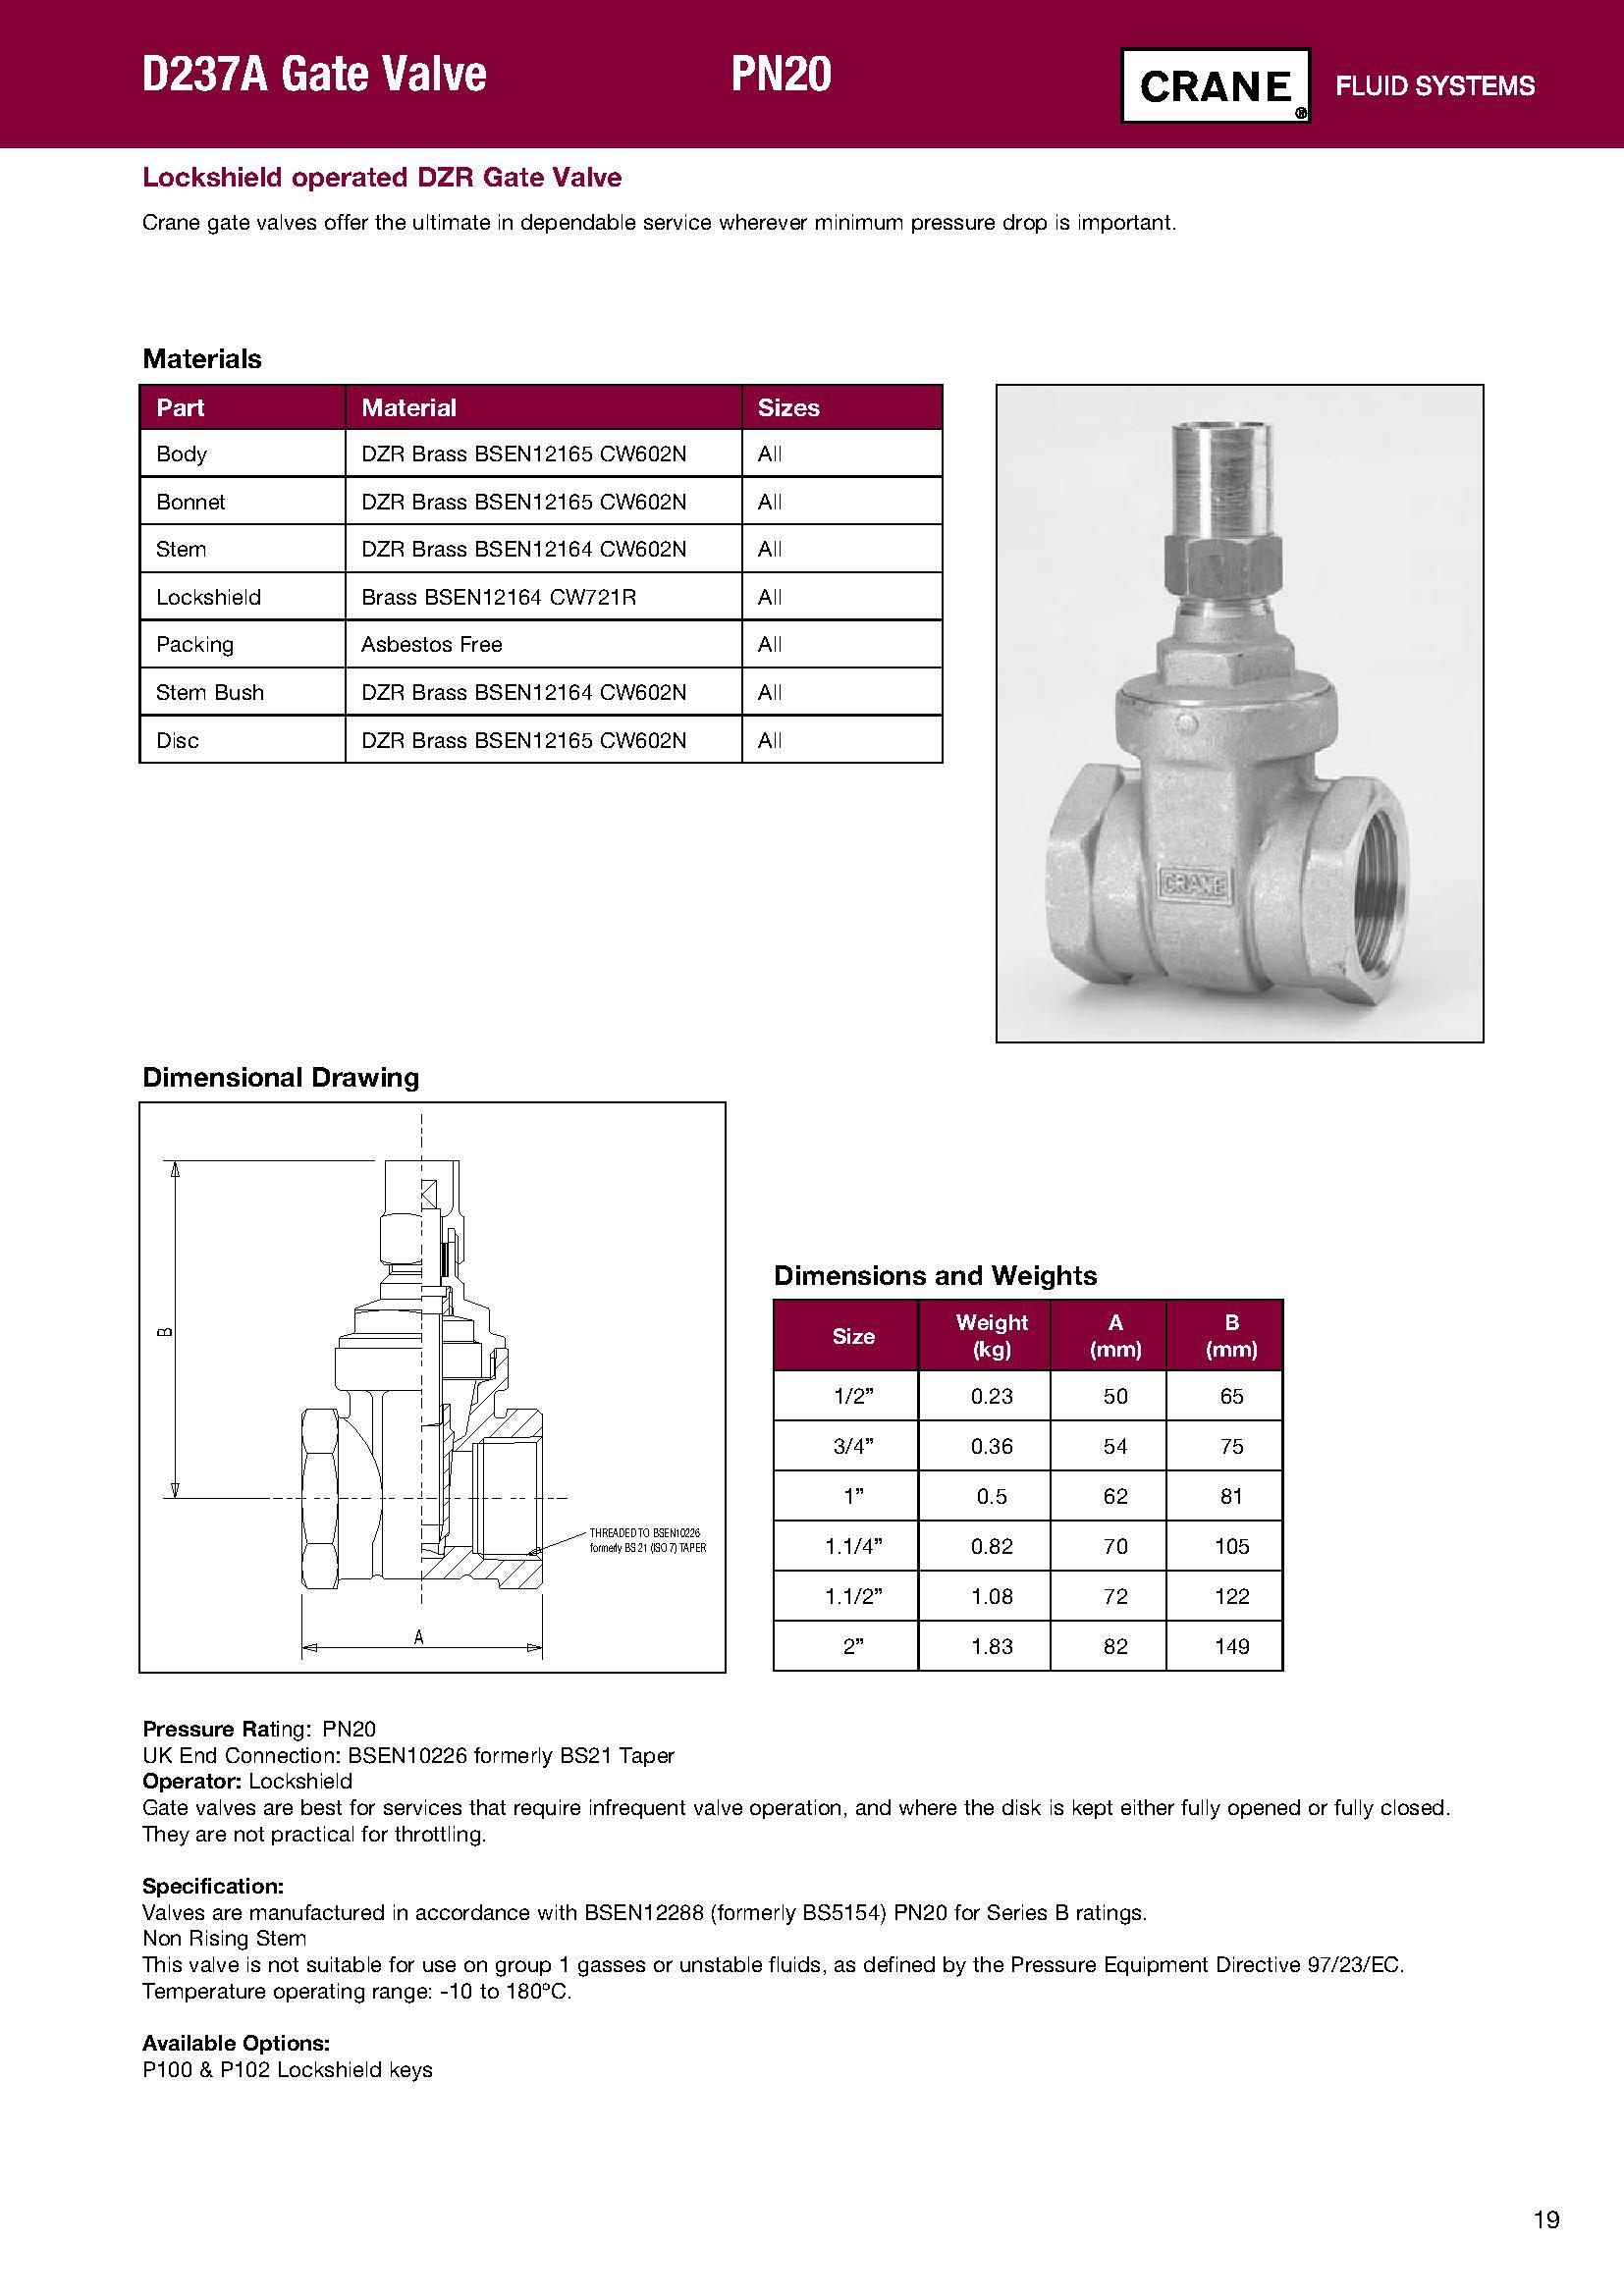 Crane d237a 34 gate valve lock shield harris bailey ltd crane d237a 34 pooptronica Images